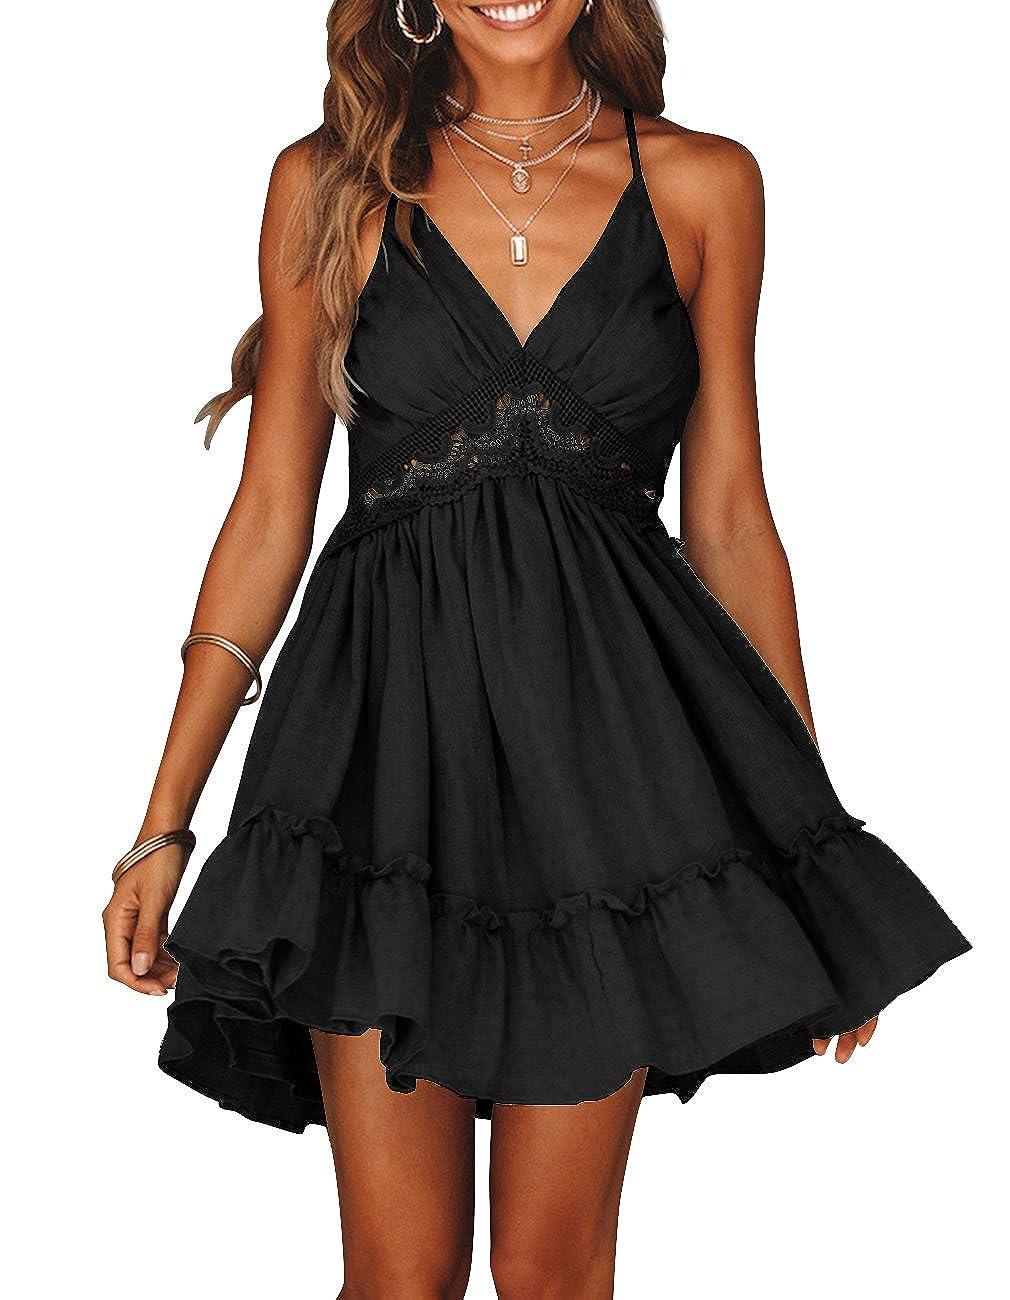 bc54a2abd8f25 Casual Beach Sundress Summer Short Dress Cute Sundresses is perfect for  Petite Womens, Ladies, Juniors, Teen girls. Bohemian halter dress features  Lace ...